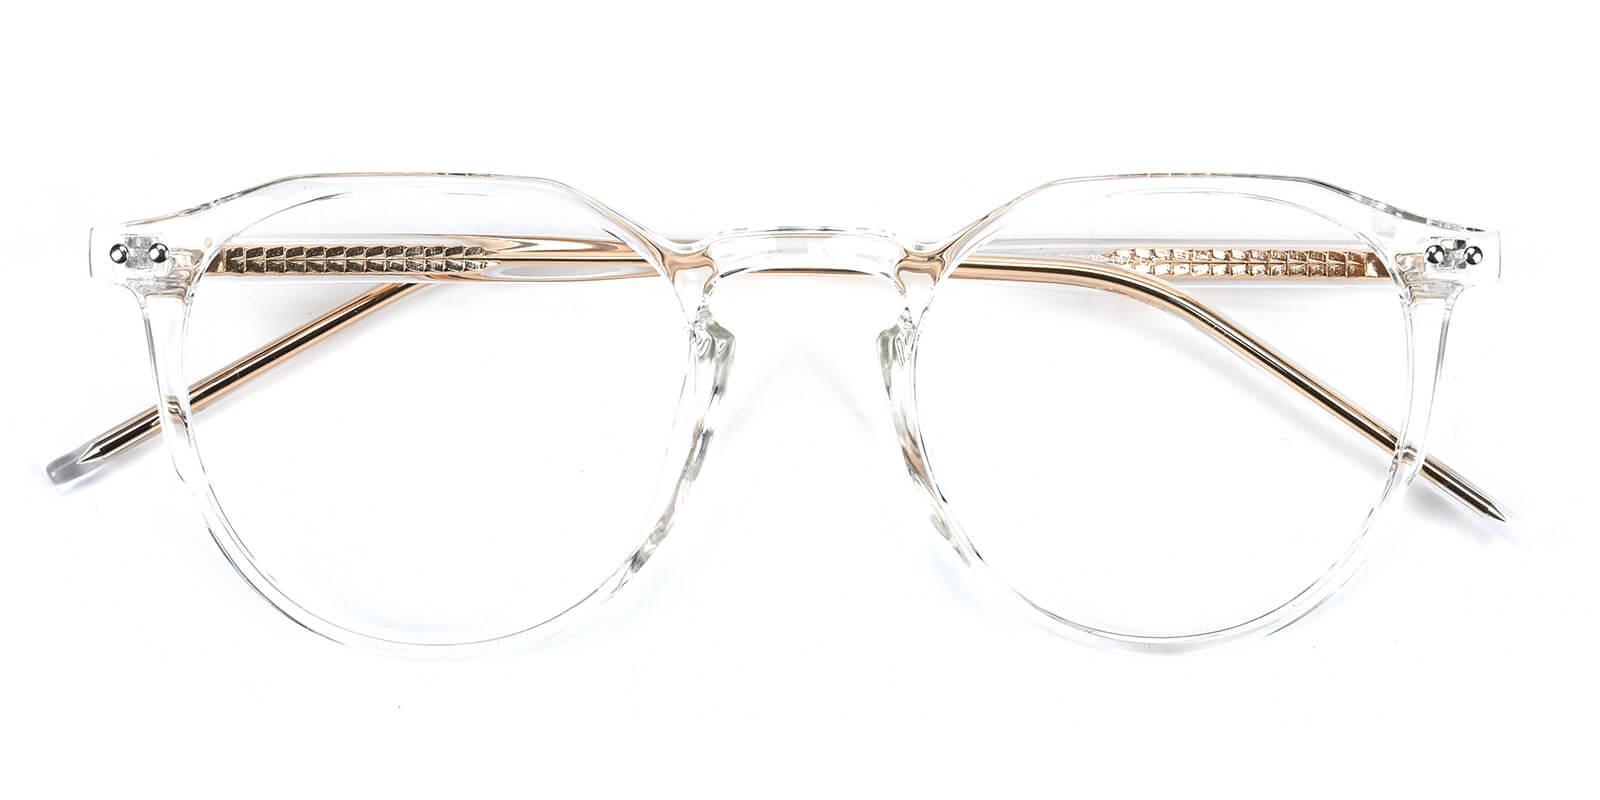 Mila-Translucent-Round-Acetate-Eyeglasses-detail